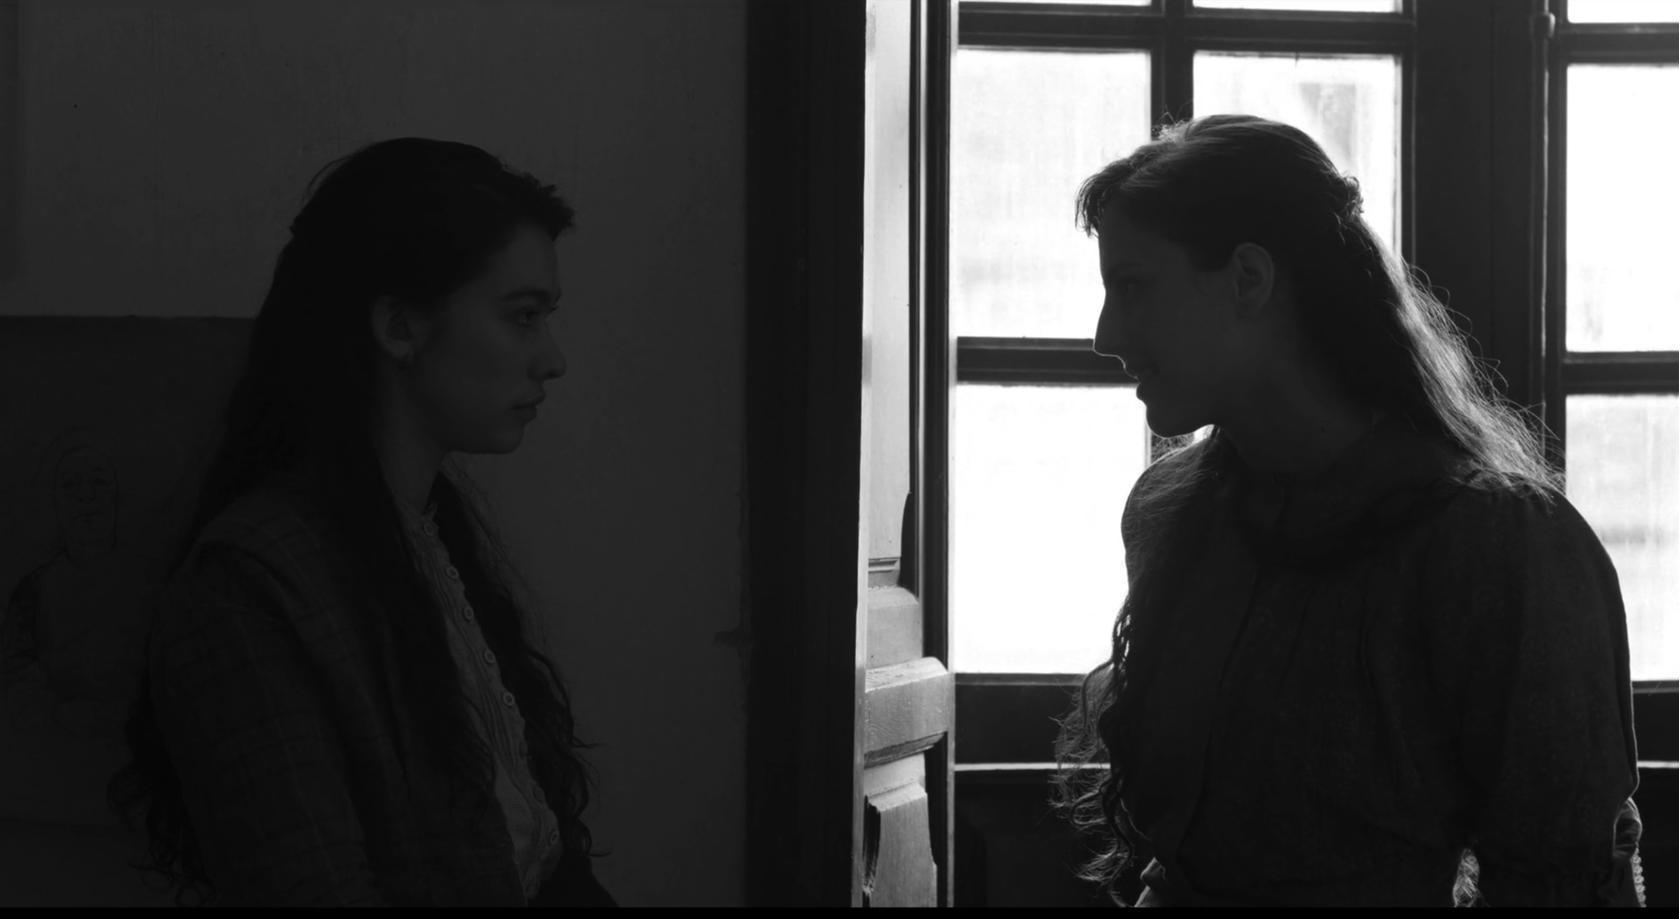 مشاهدة فيلم Elisa y Marcela (2019) مترجم HD اون لاين